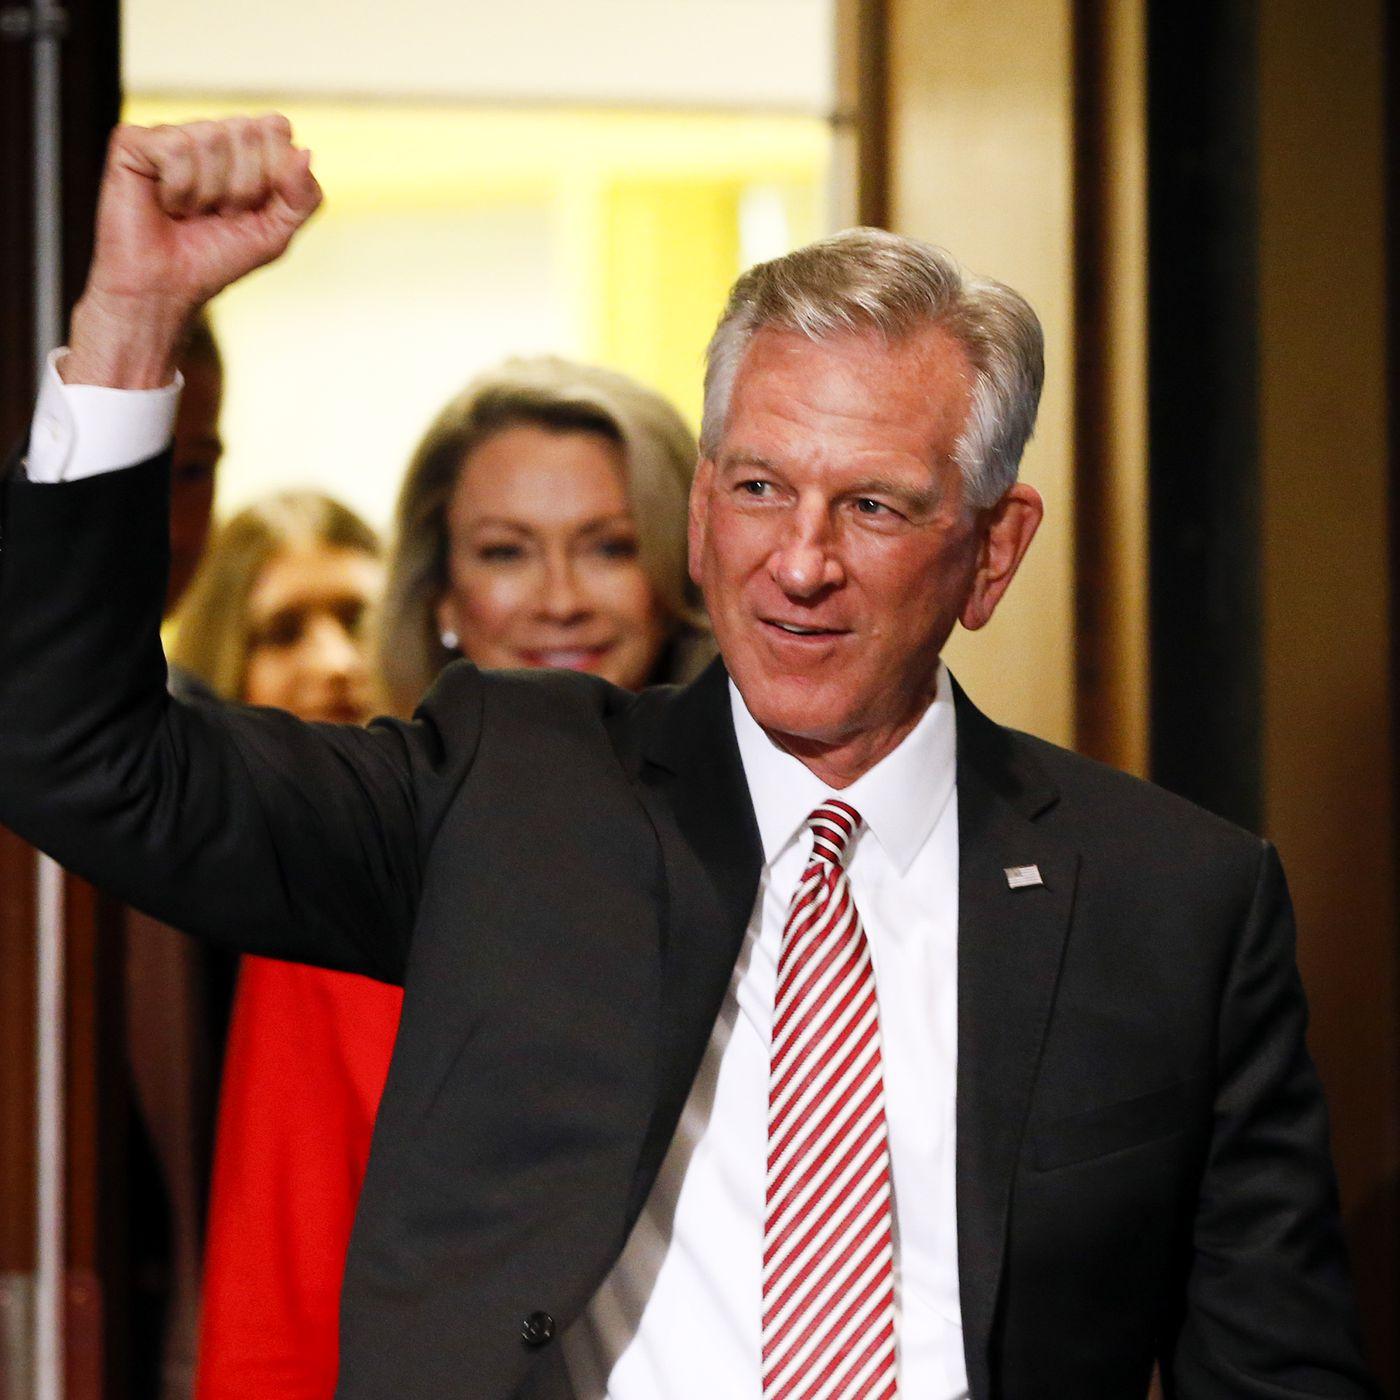 Tommy Tuberville wins Alabama Senate race, defeating Doug Jones - Vox